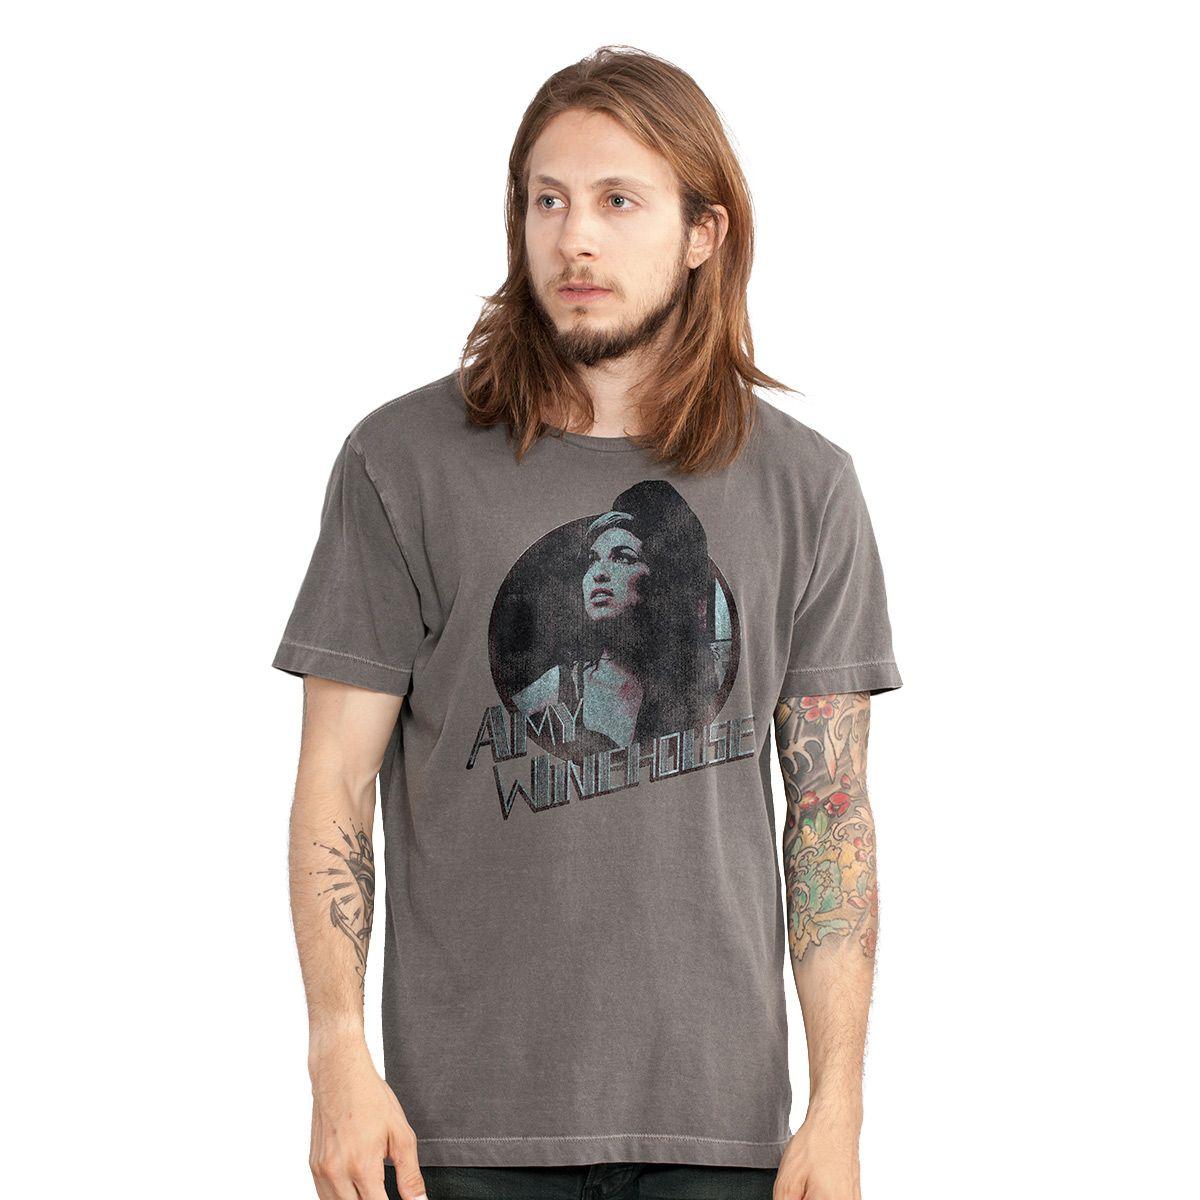 T-shirt Premium Masculina Amy Winehouse Retrô